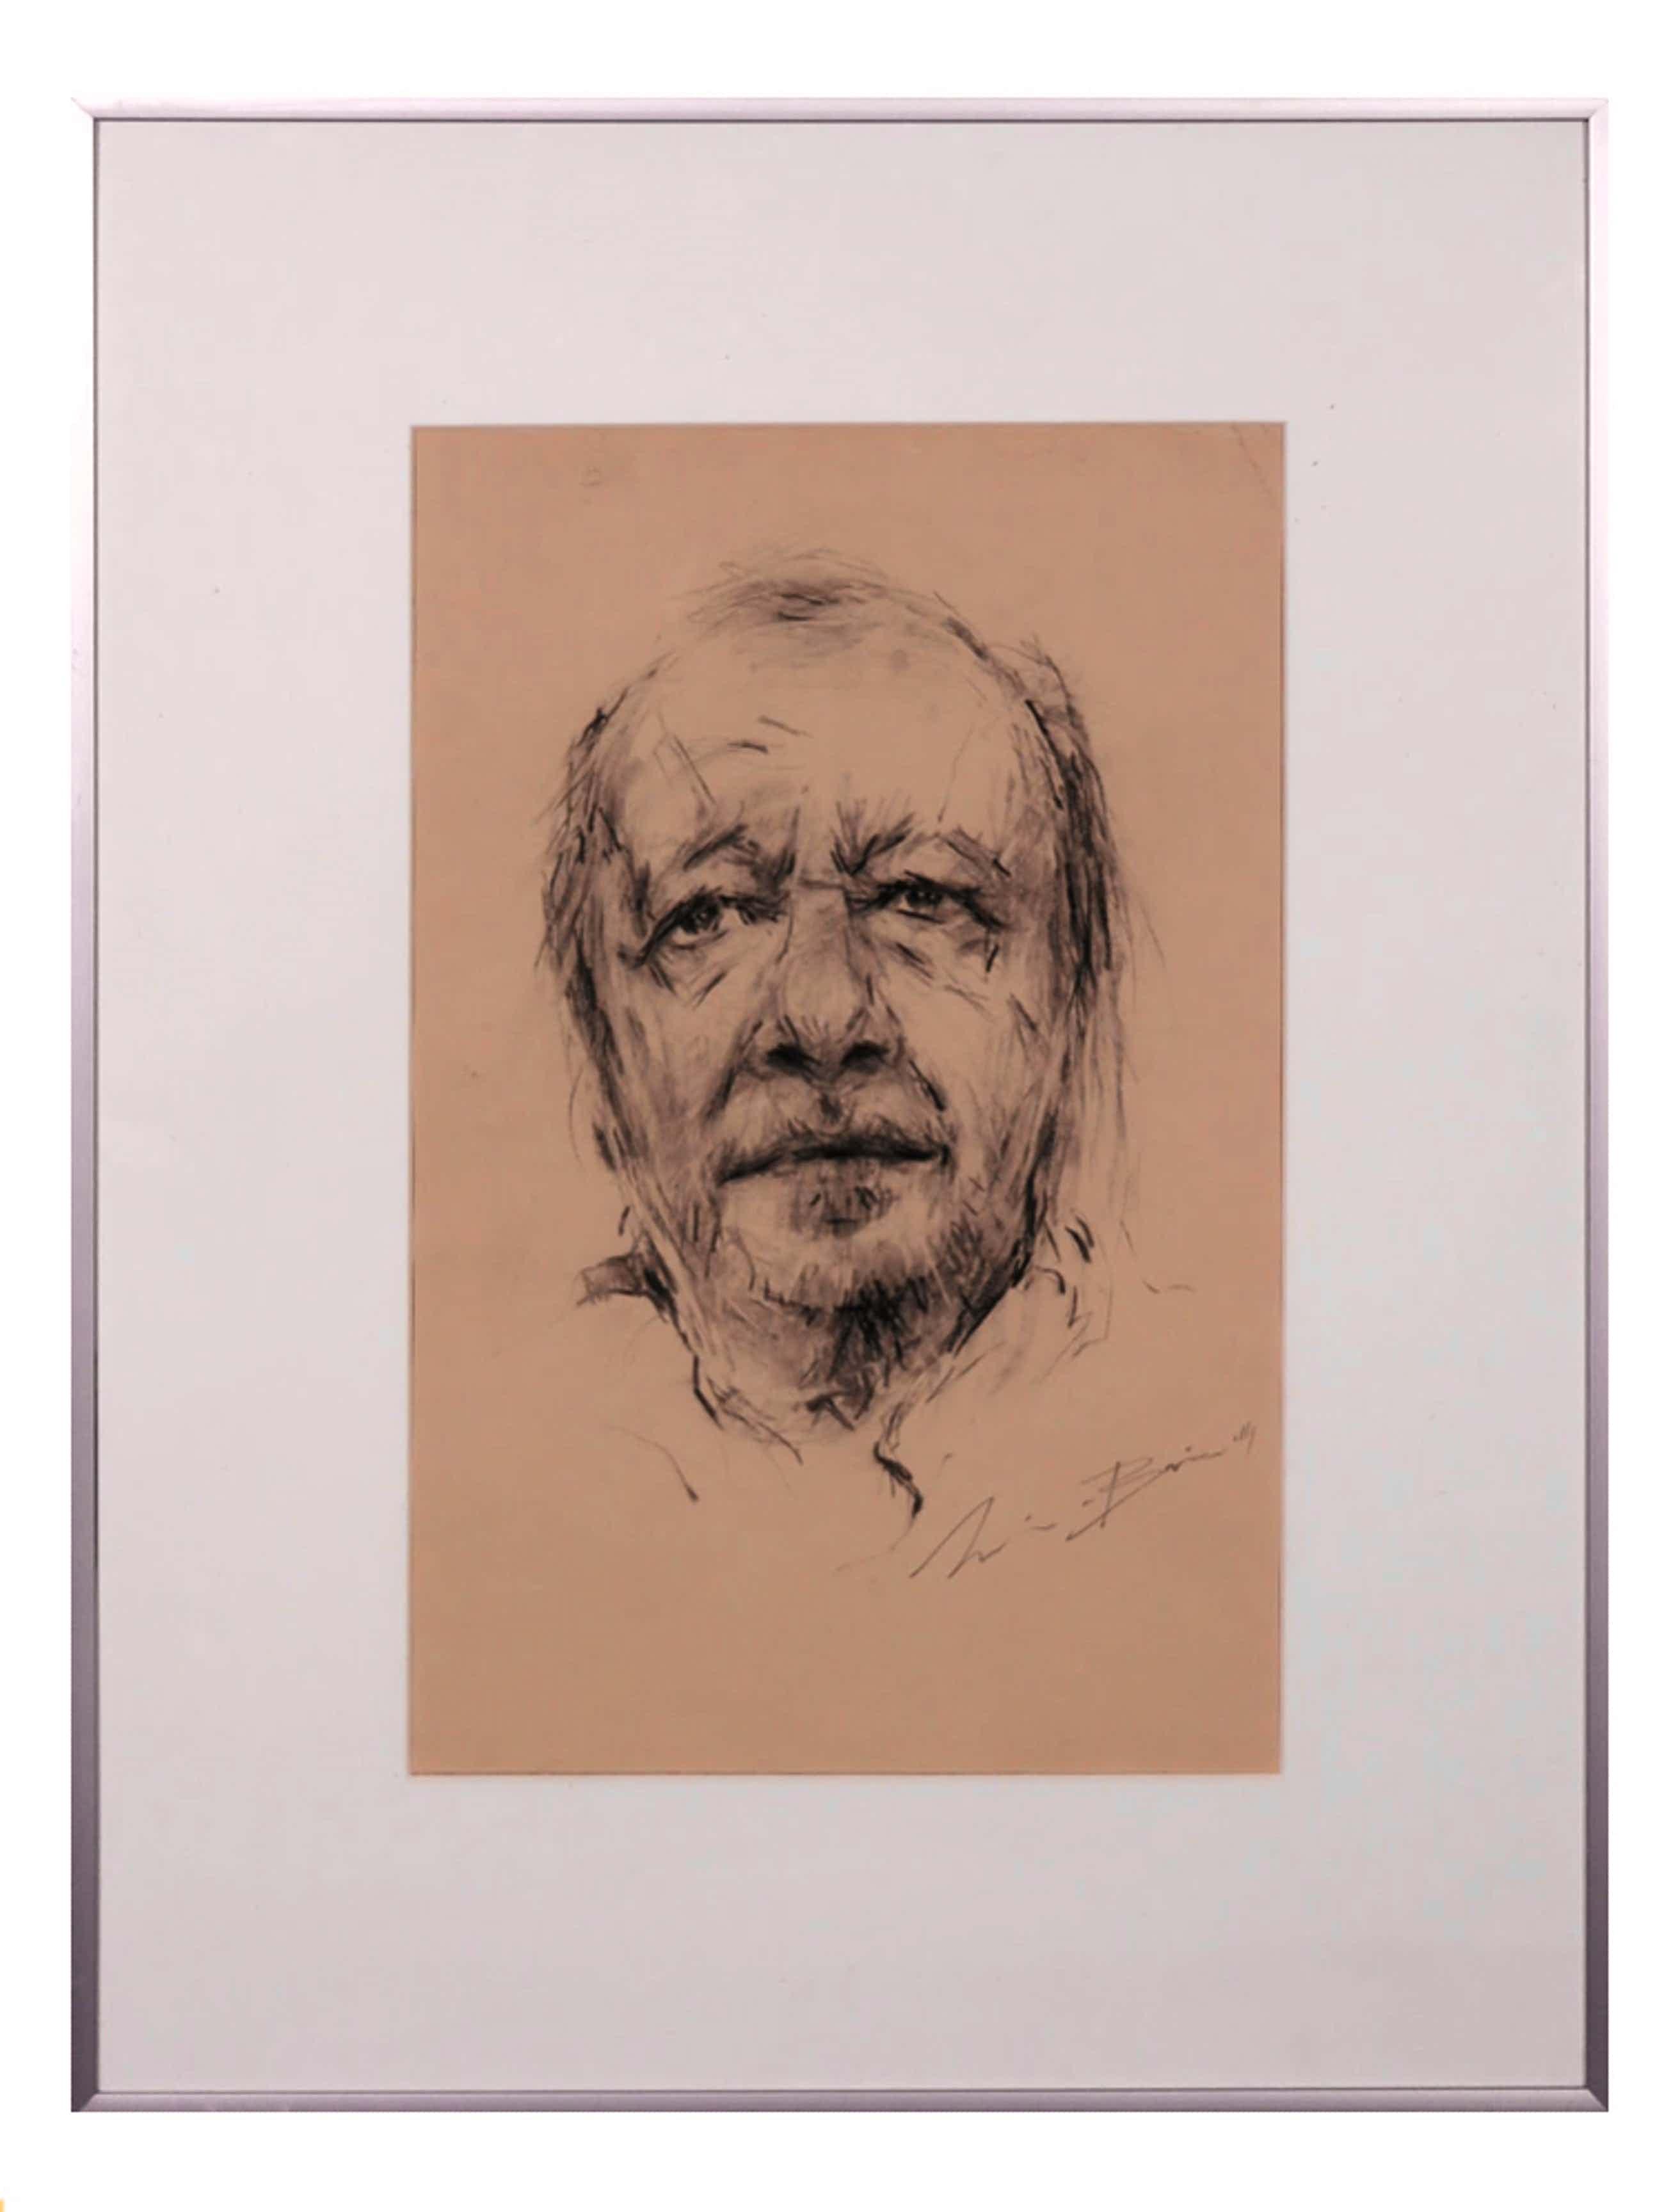 Wim de Bruin - Portret Ramses Shaffy kopen? Bied vanaf 65!